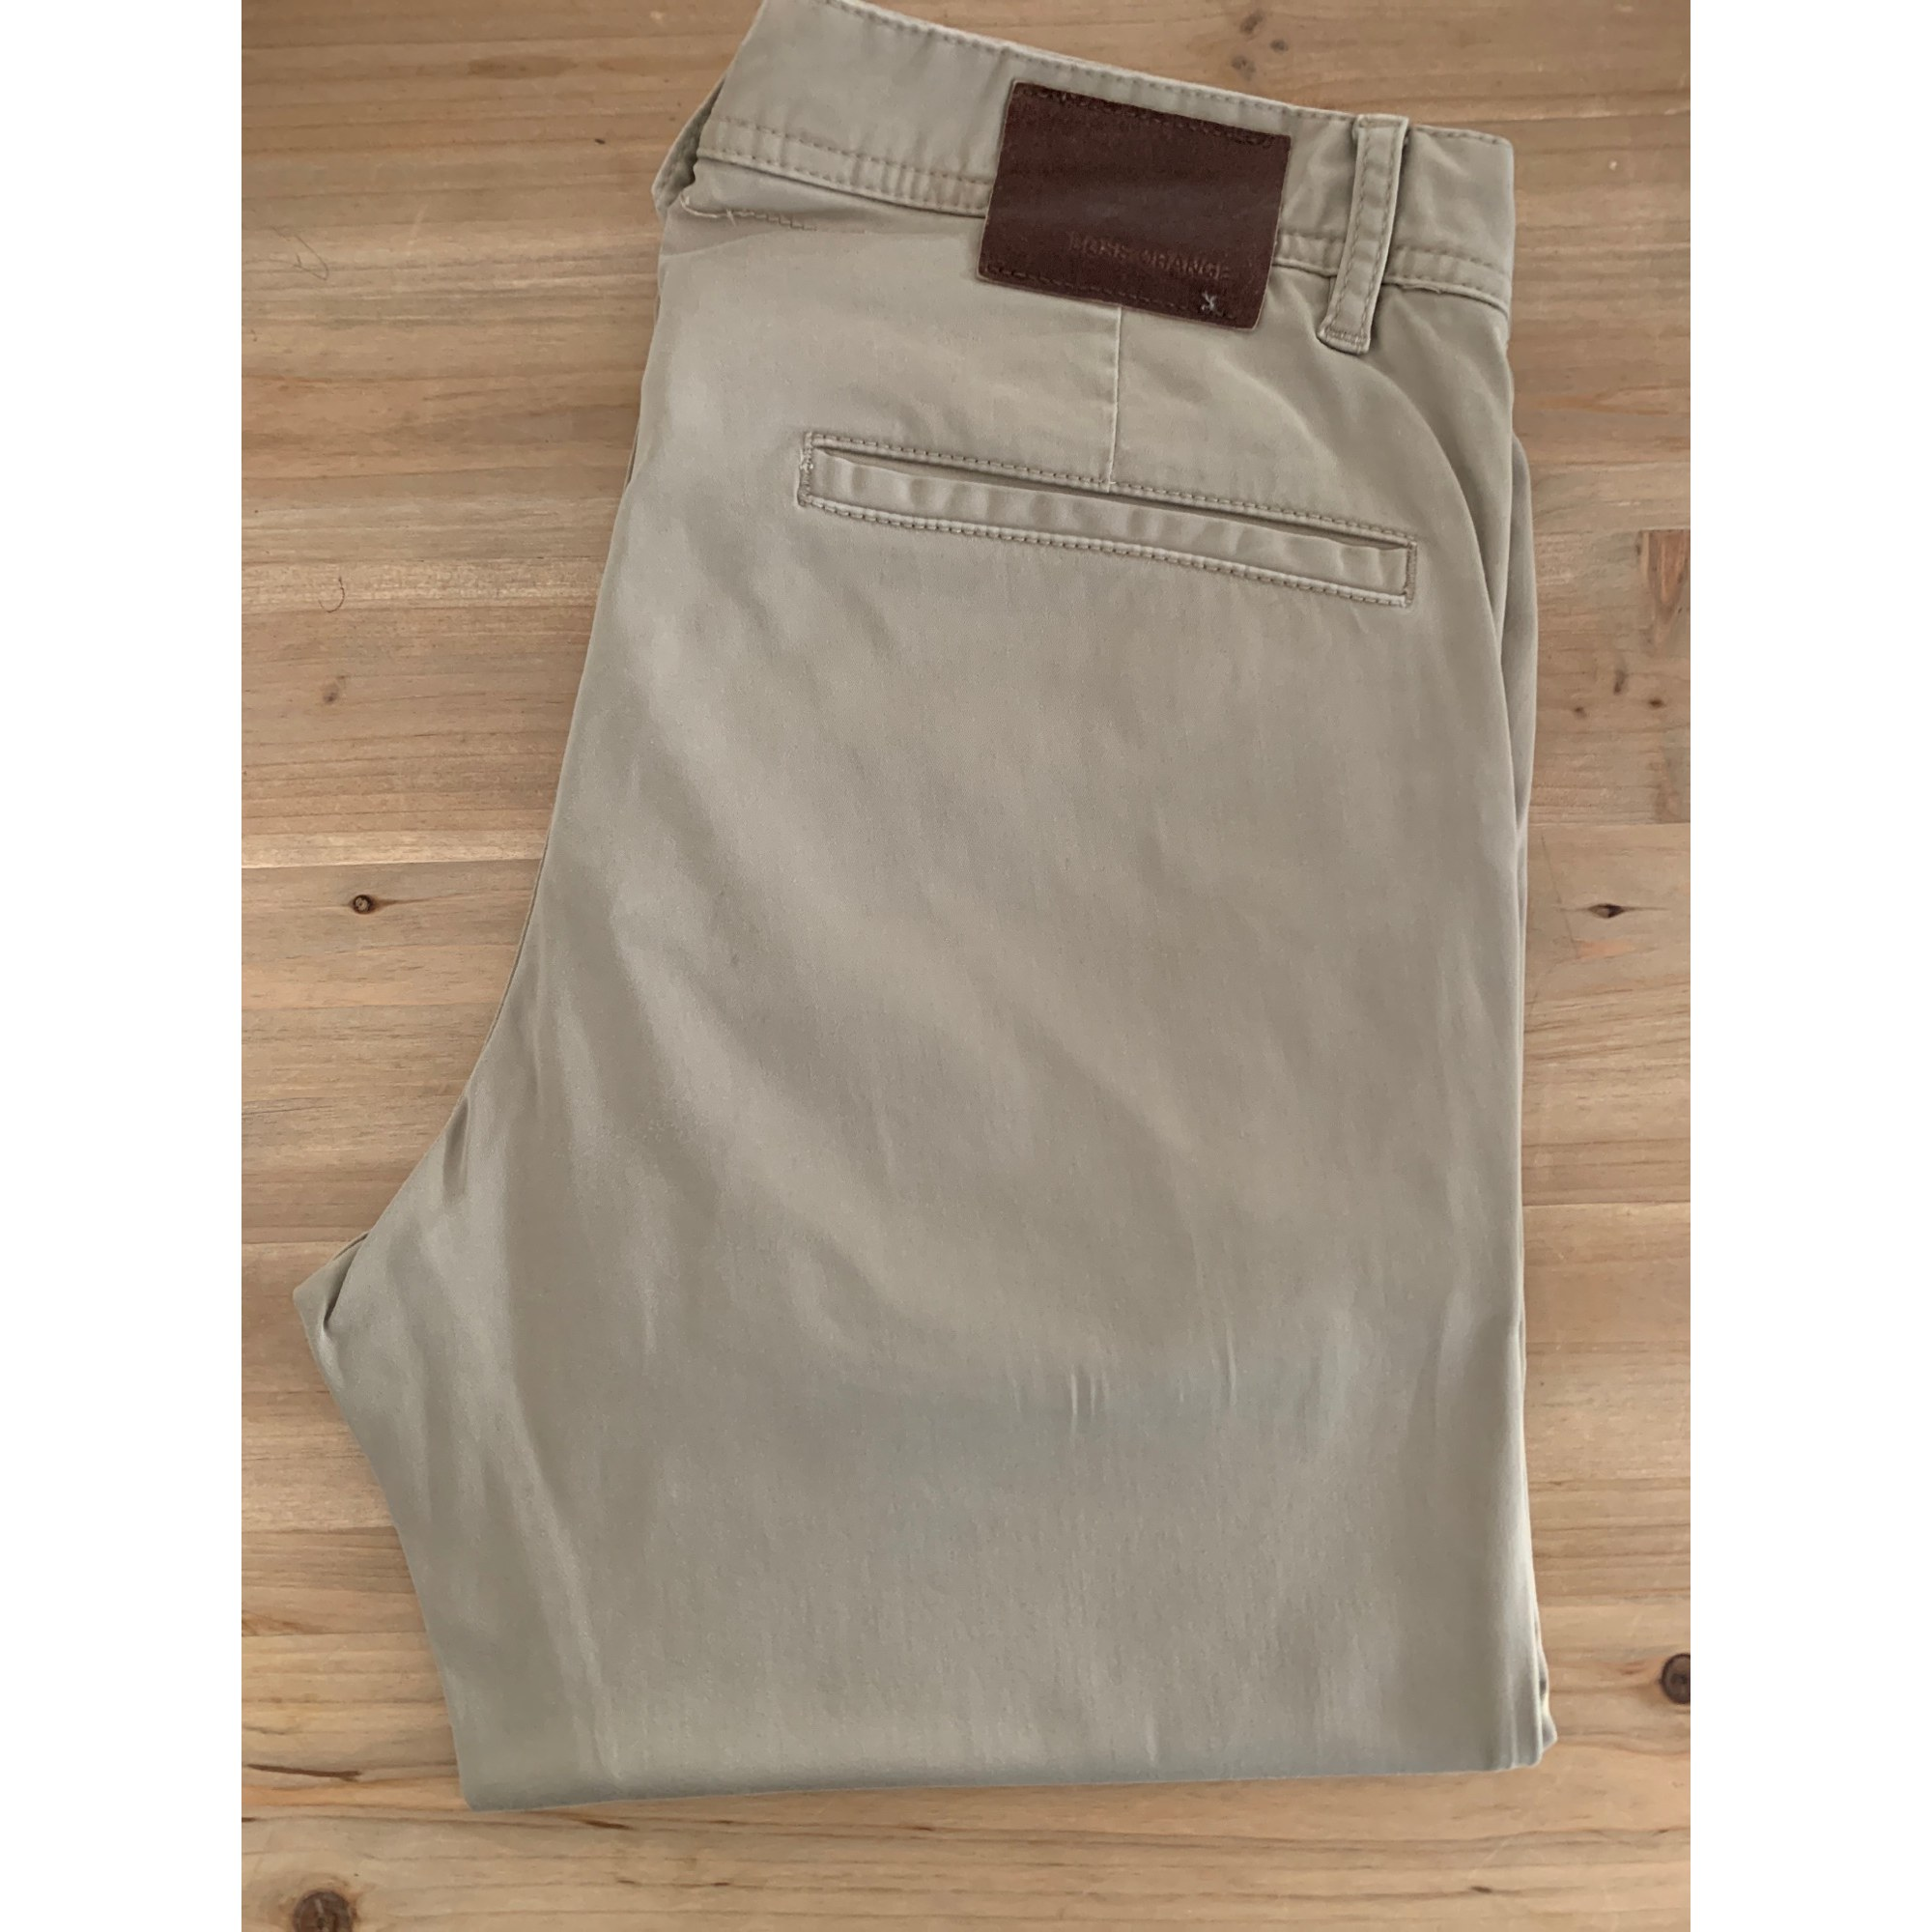 Pantalon droit HUGO BOSS Beige, camel